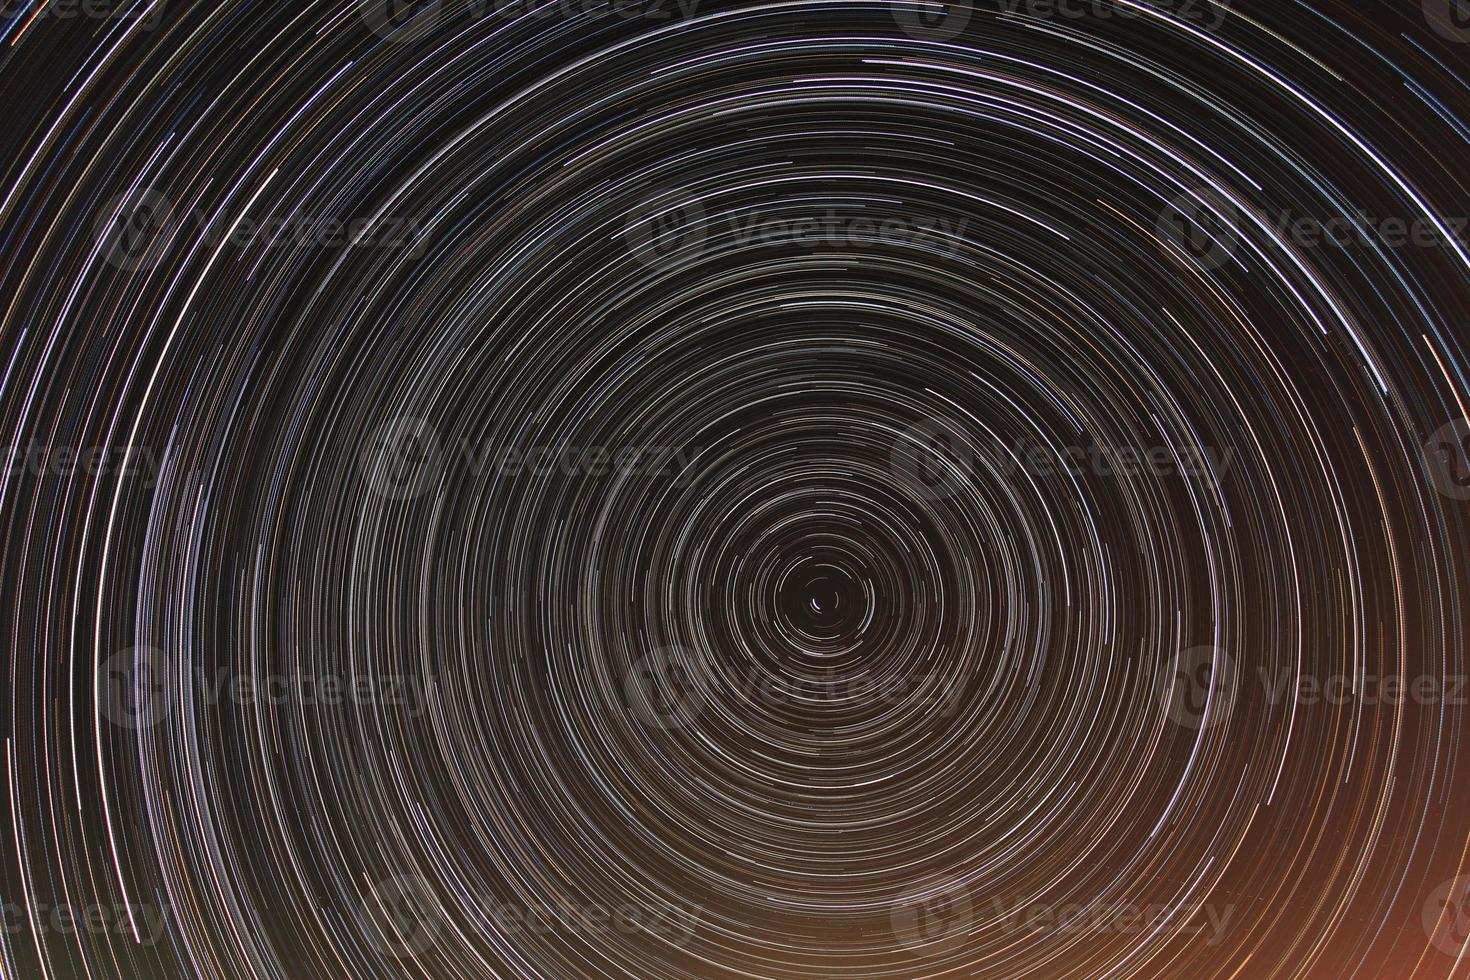 star trails at night sky photo